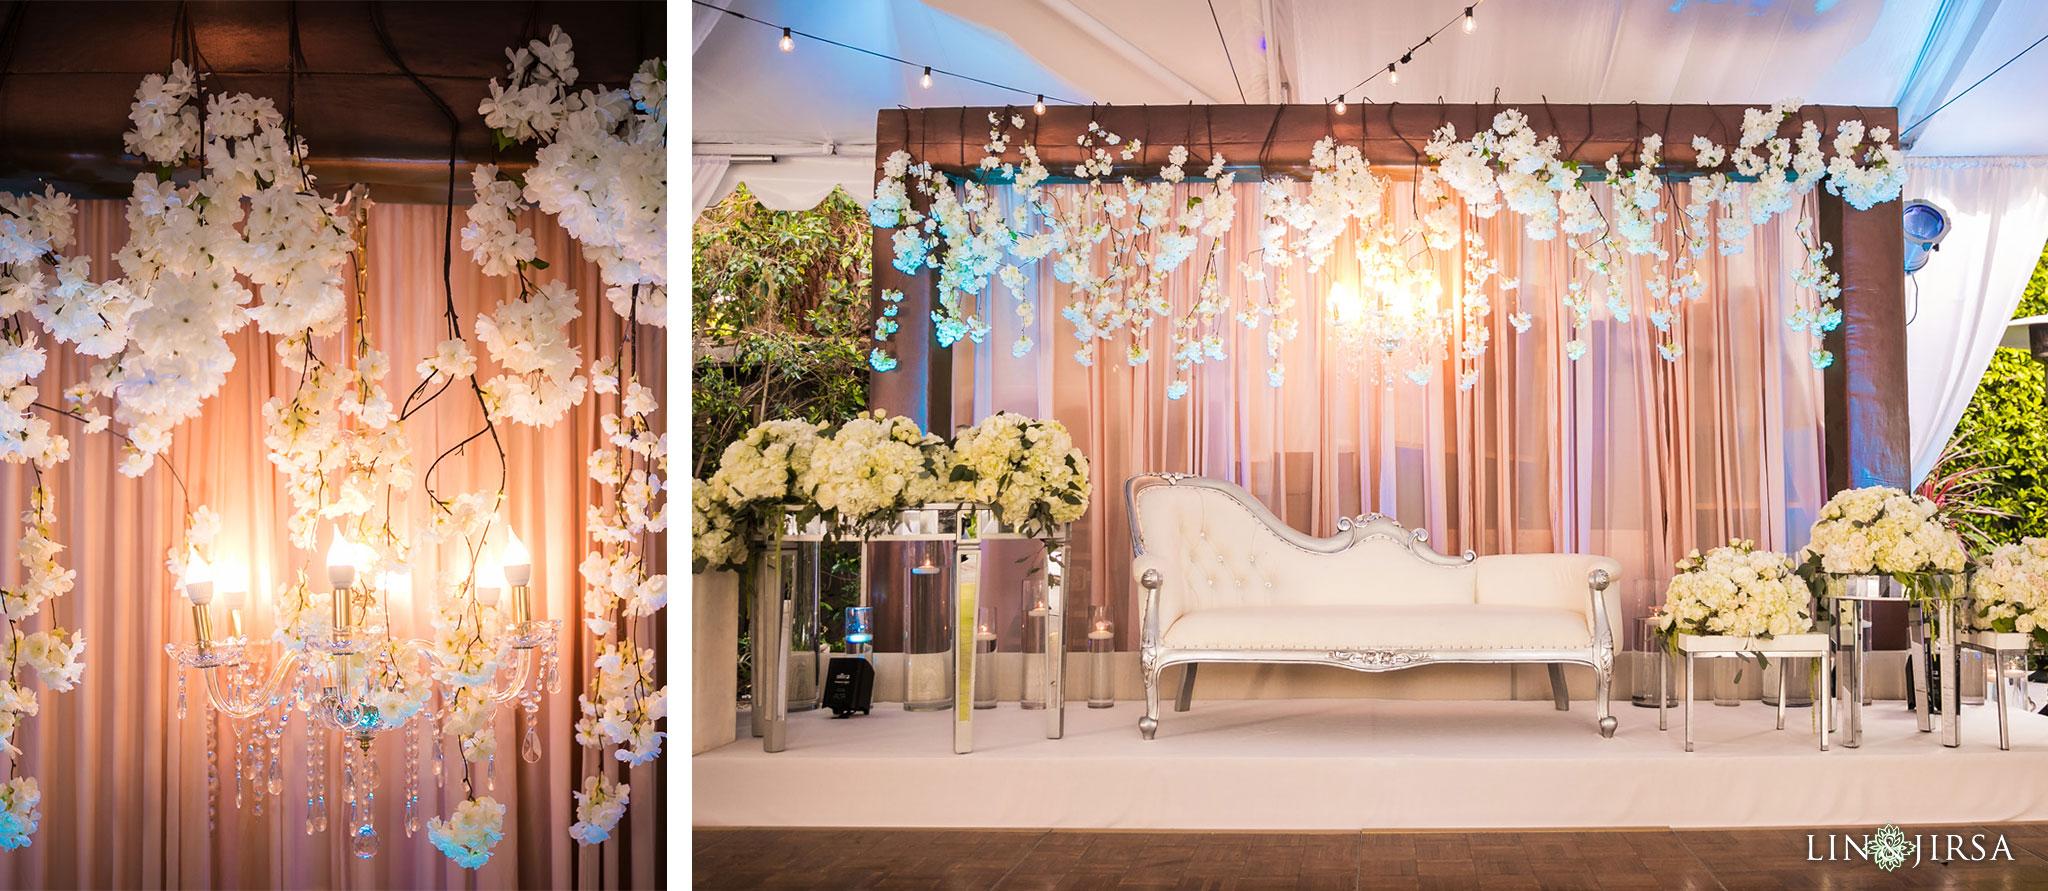 53 sportsmens lodge studio city indian wedding reception photography